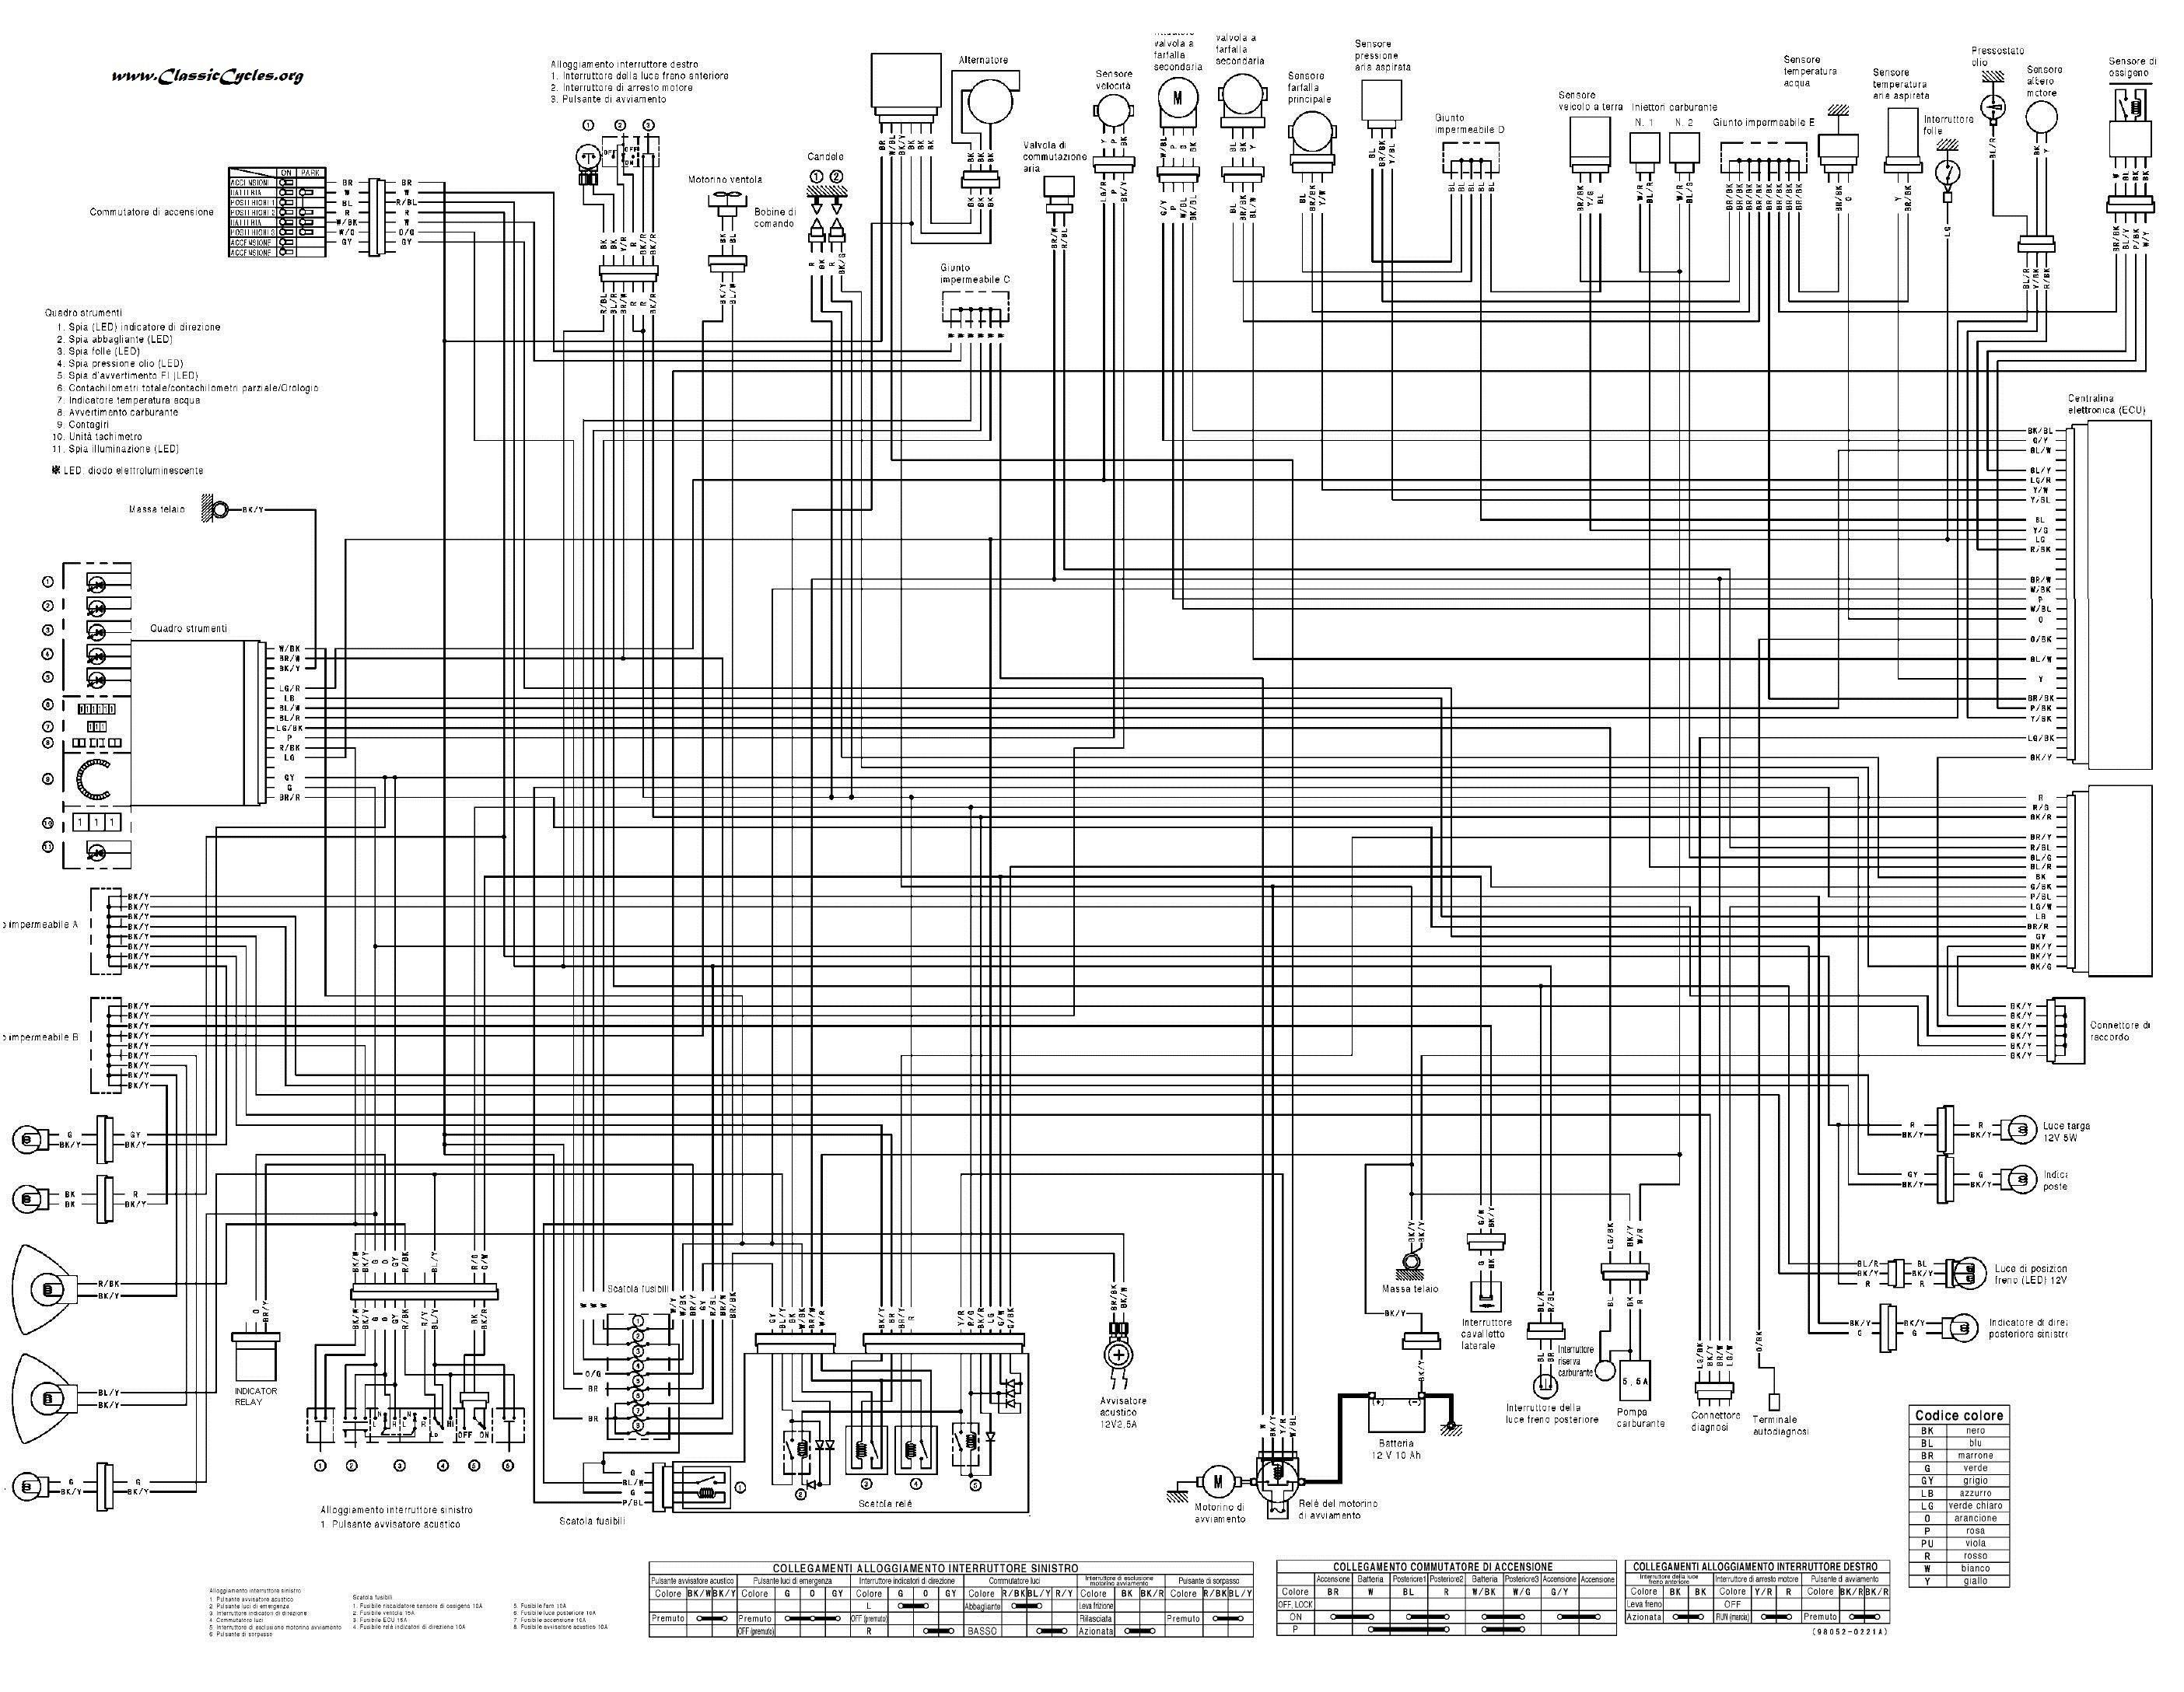 Motorcycle Electrical Diagram Kawasaki Kz750 Twin Wiring Diagram Moreover ford Radio Wiring Of Motorcycle Electrical Diagram